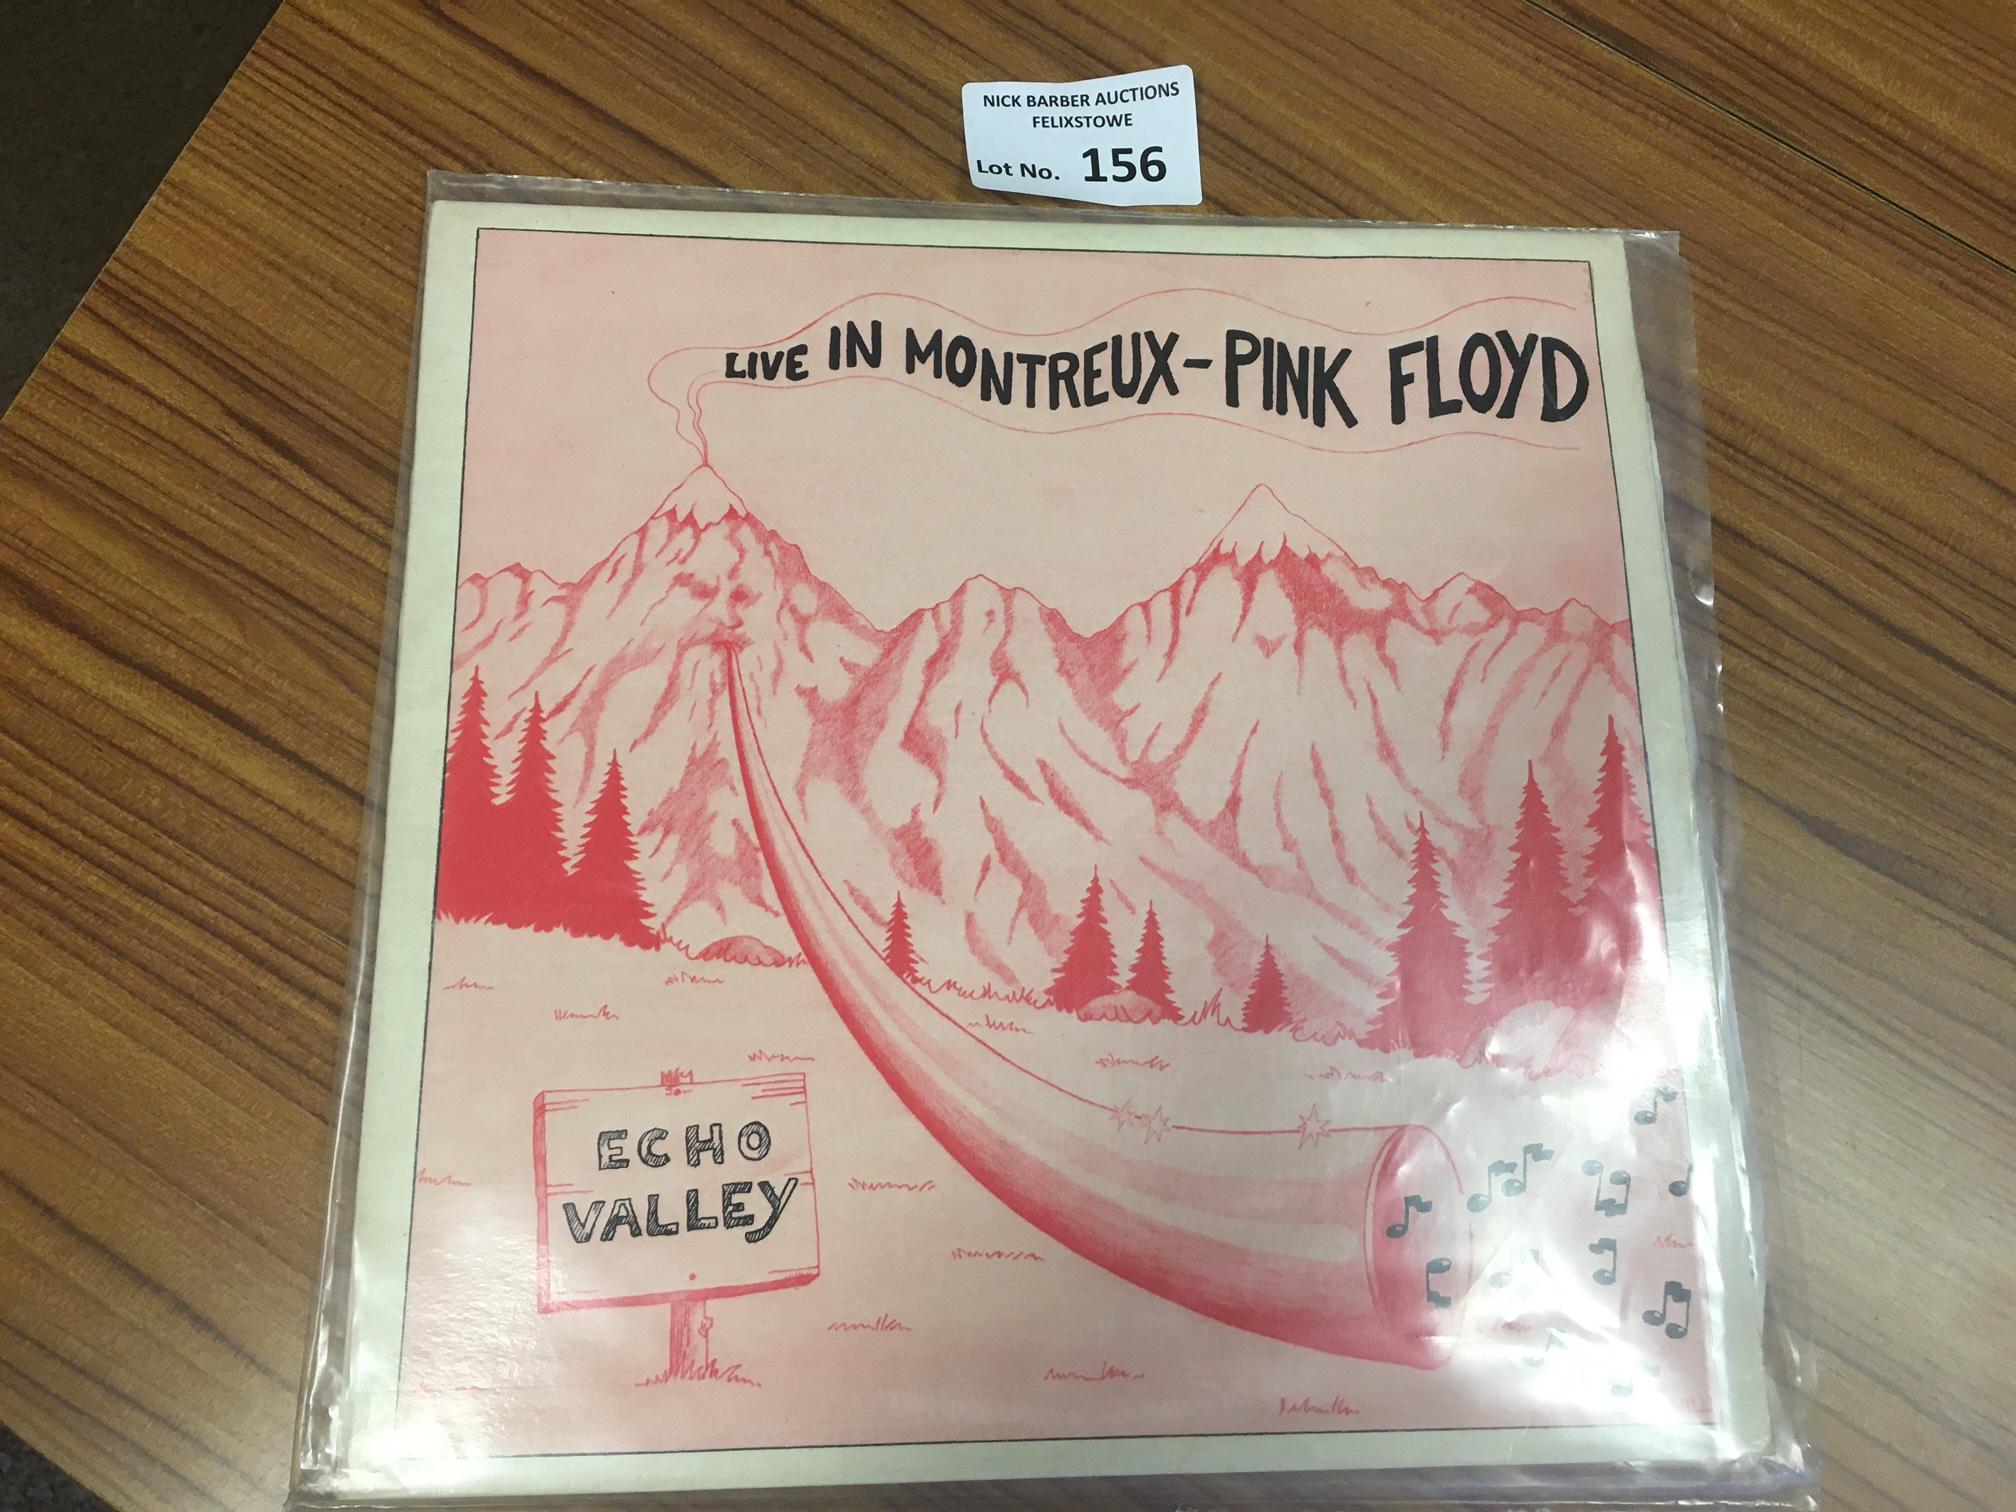 Records : PINK FLOYD - Rarities - 'Live in Montreu